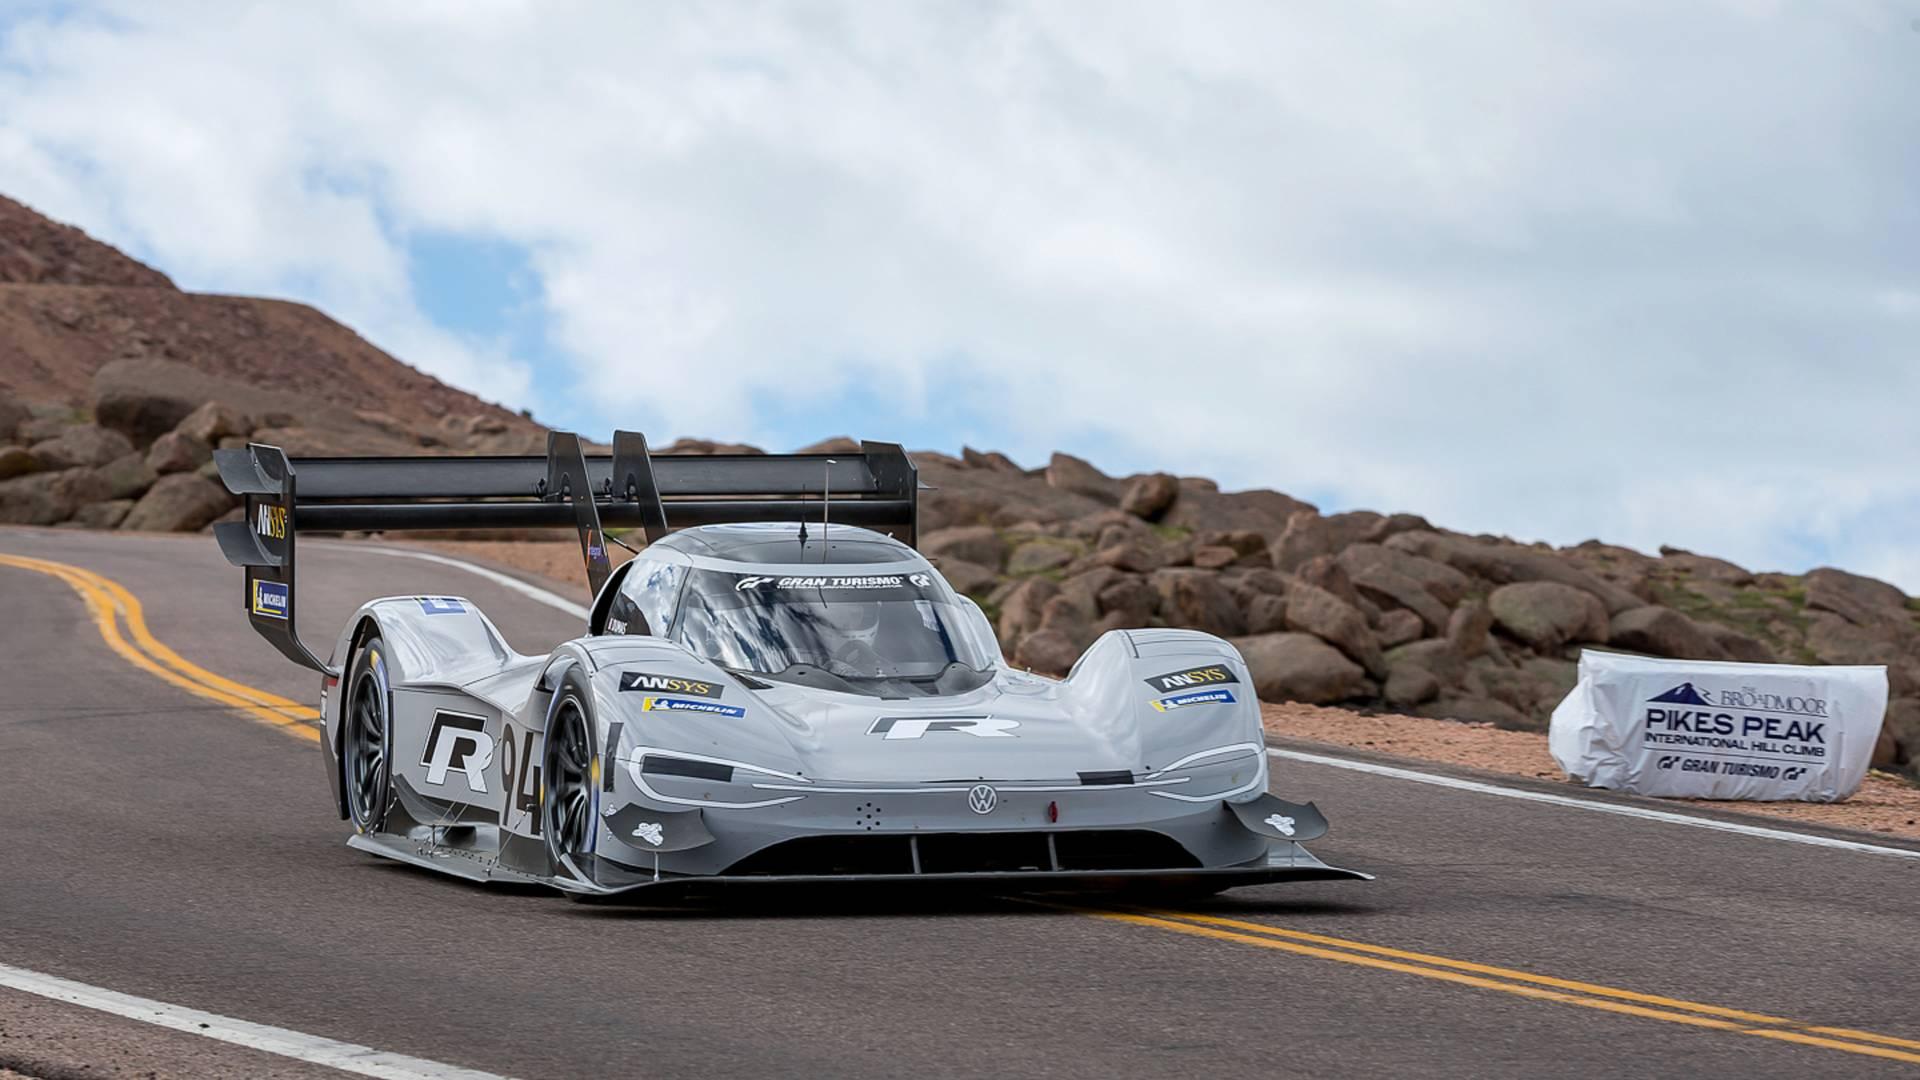 volkswagen 39 shocks 39 its competitors racedepartment. Black Bedroom Furniture Sets. Home Design Ideas